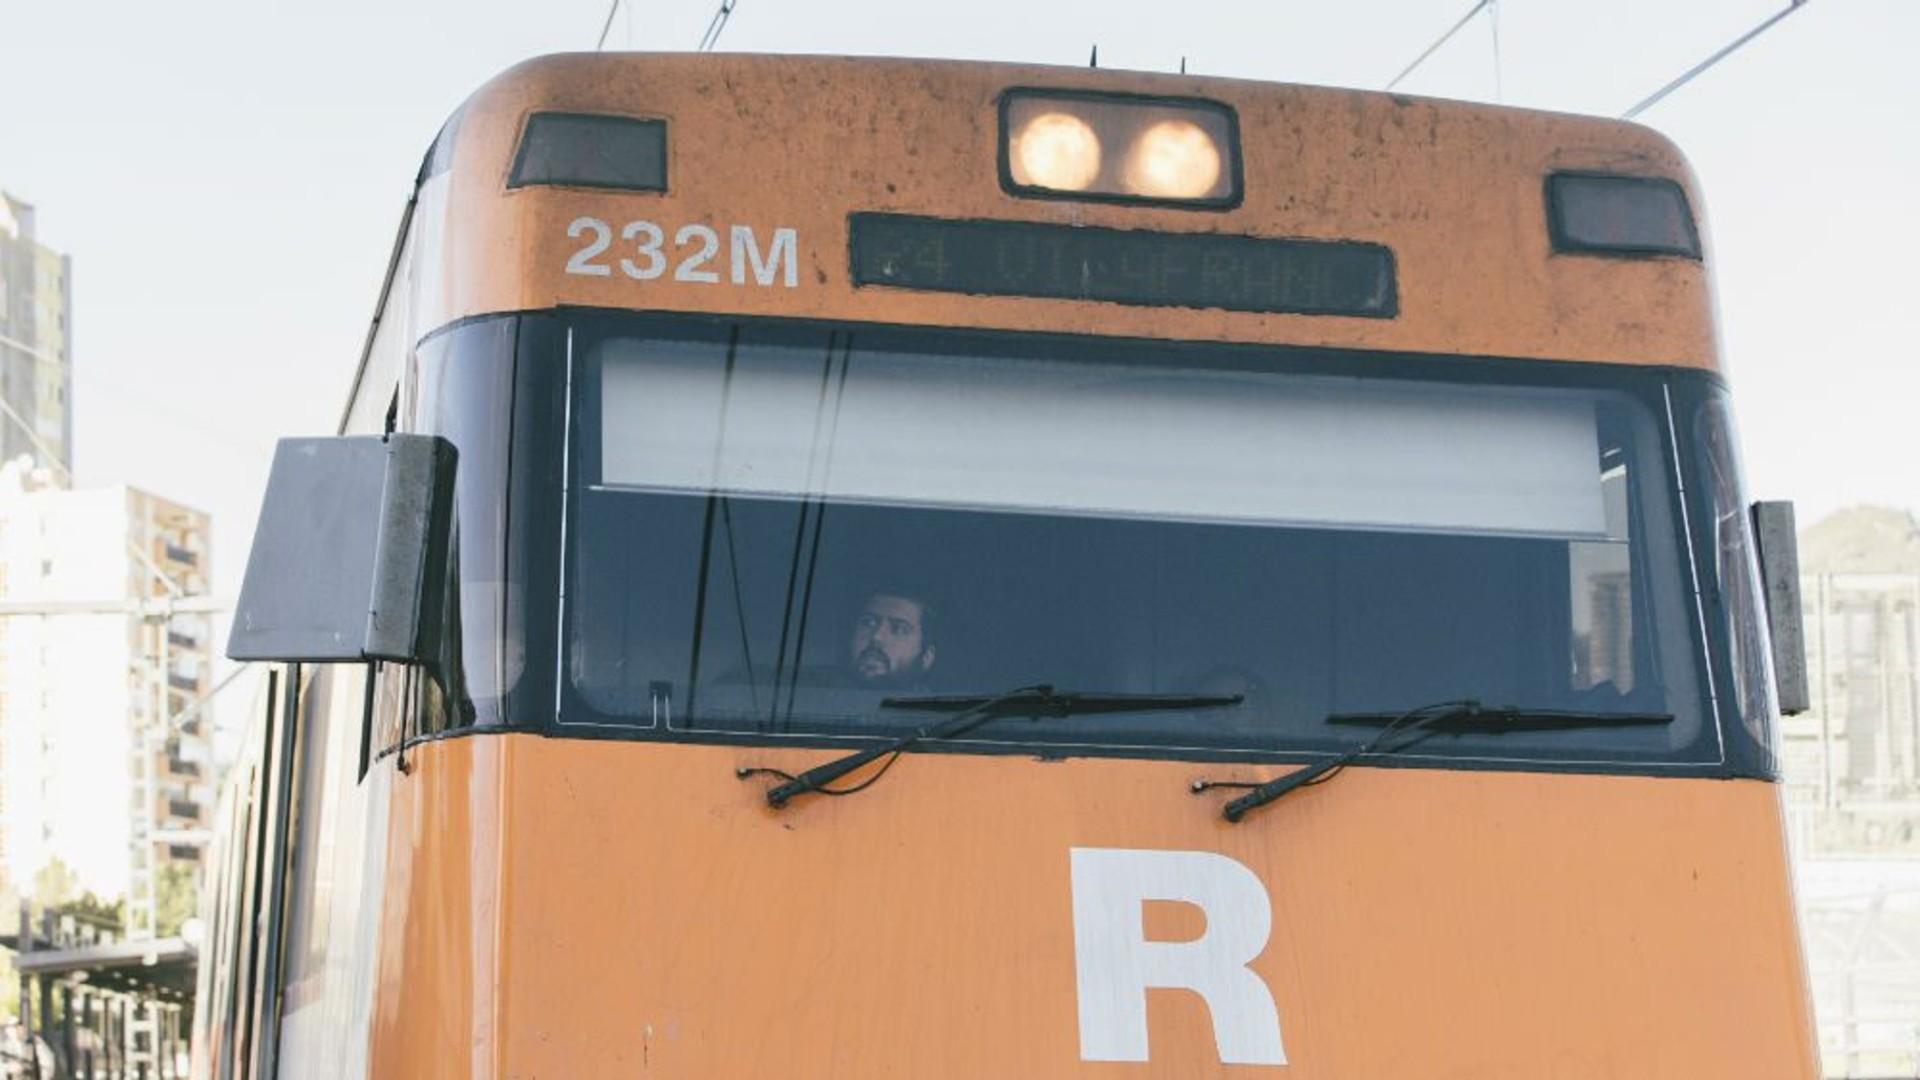 Vaga Renfe trens